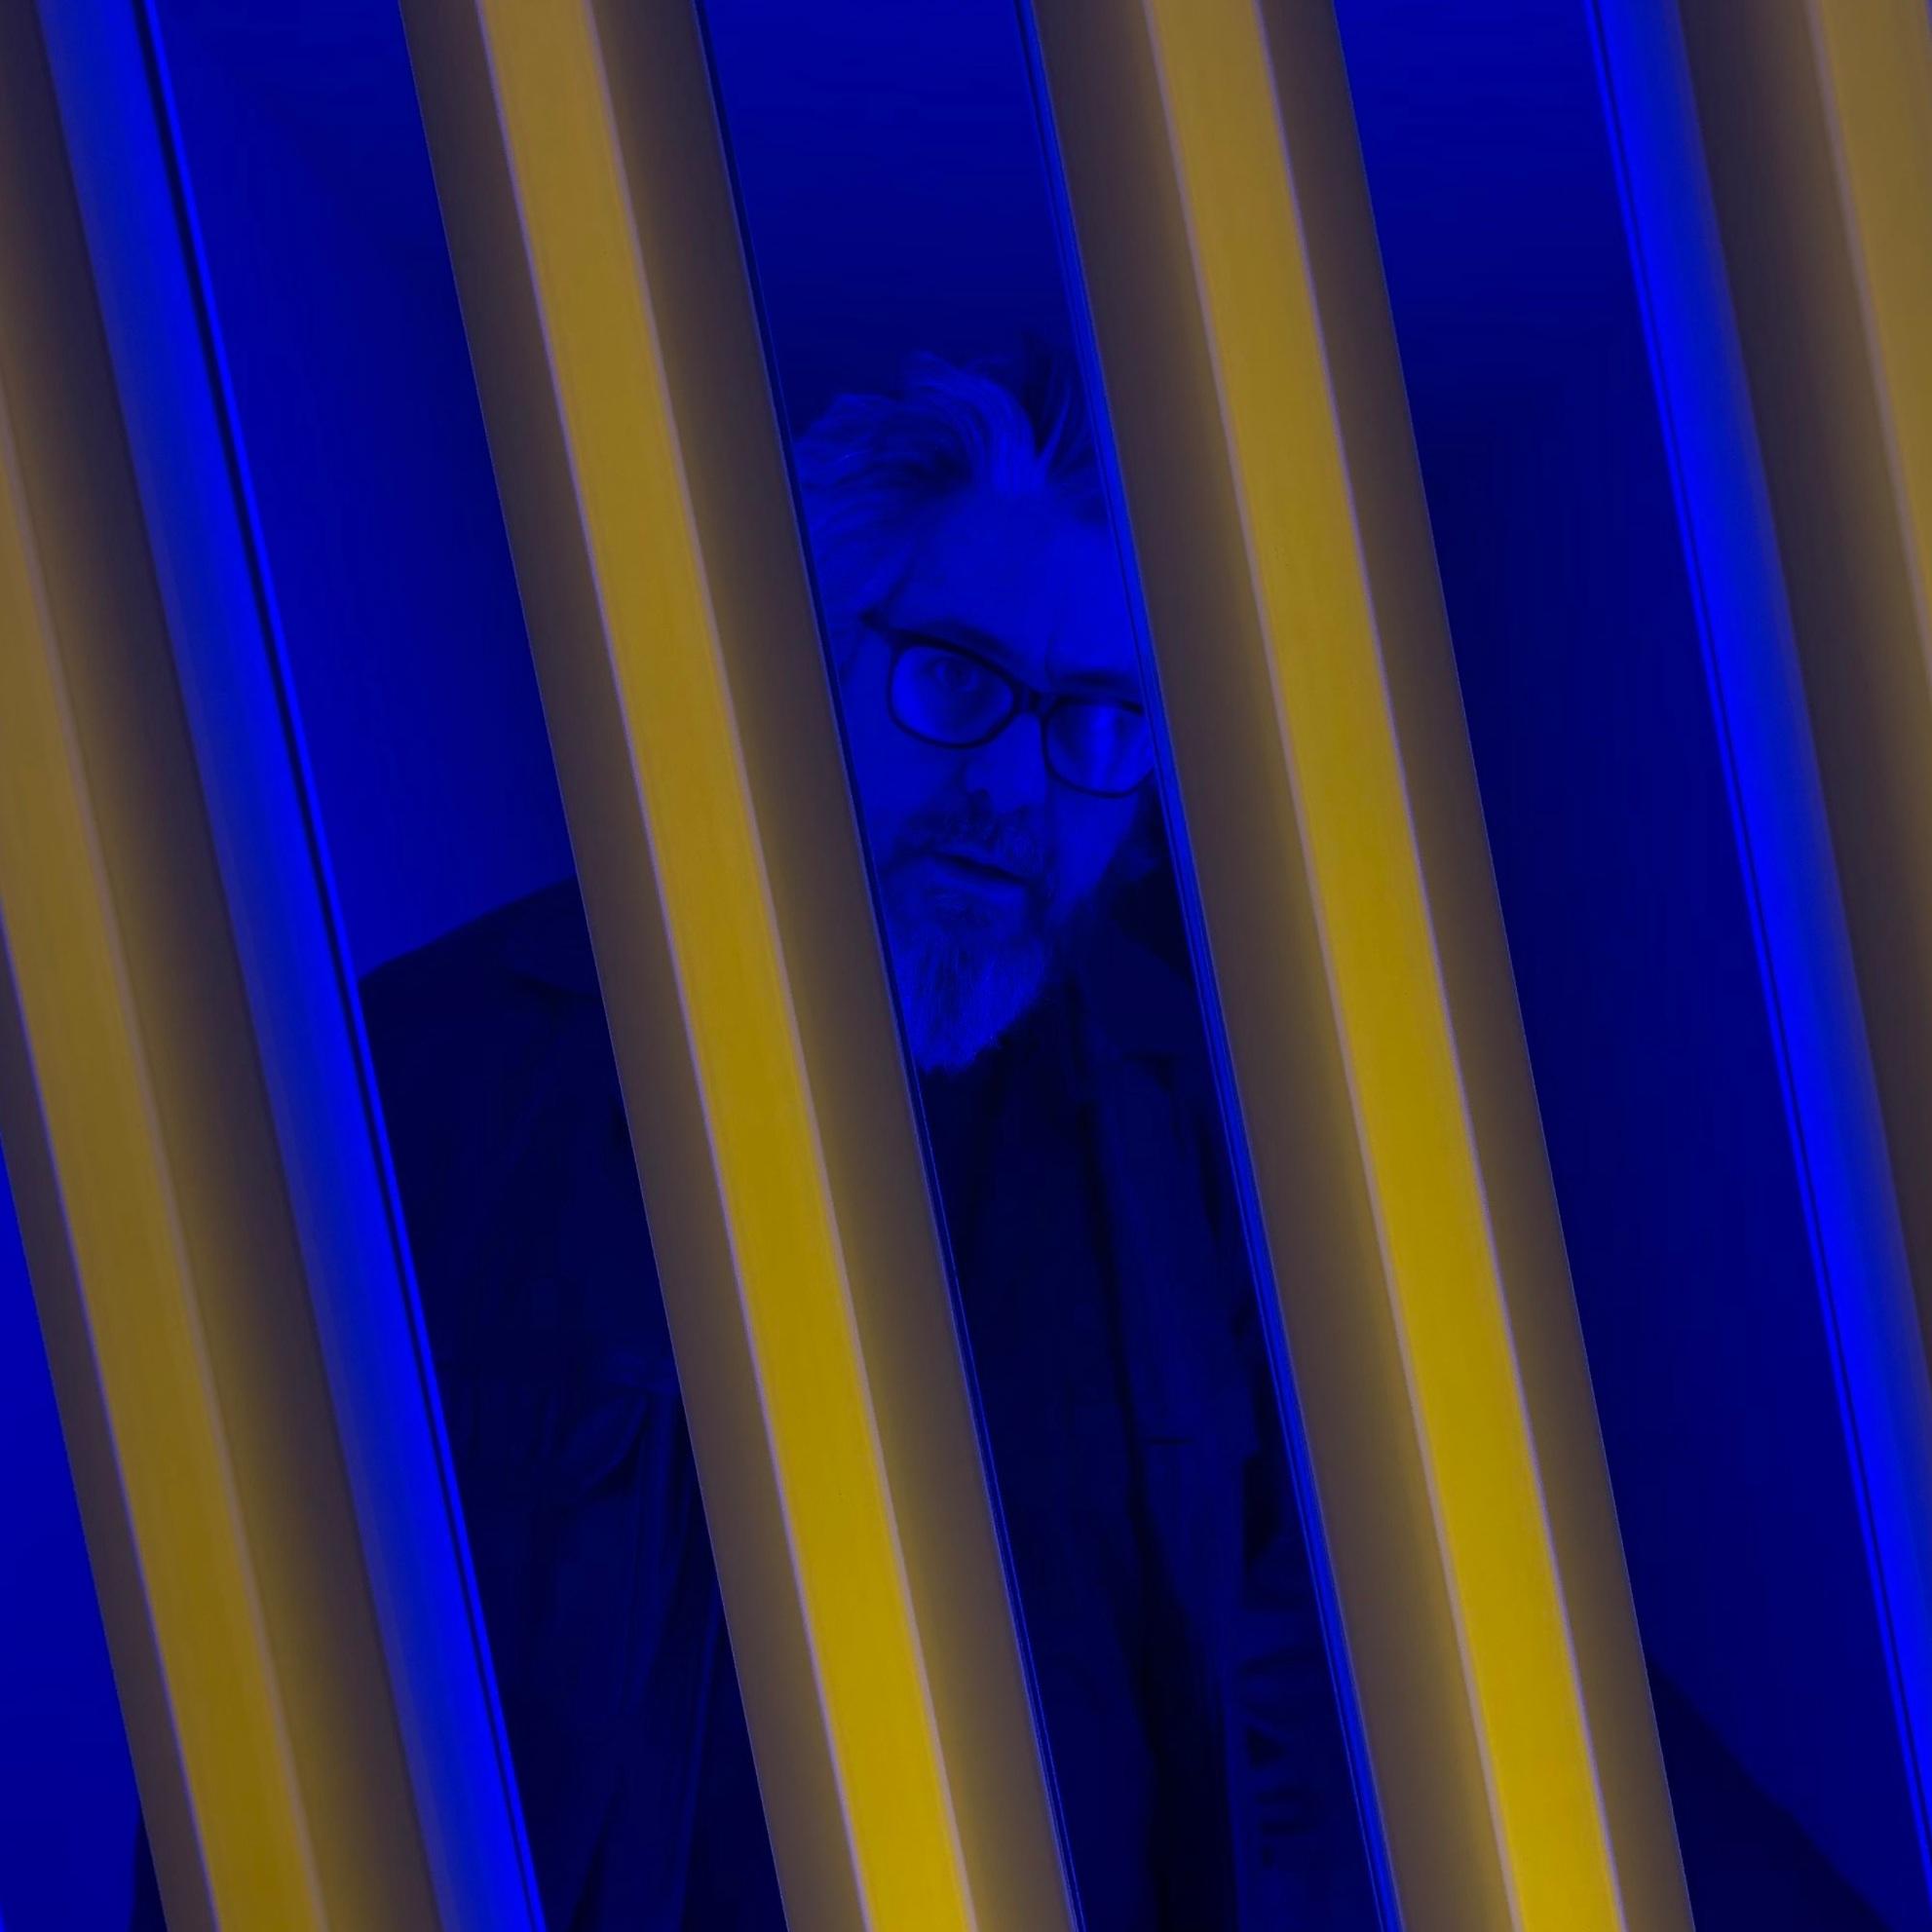 Peering through the fluorescent lights at Dan Flavin's exhibit in Marfa, Texas